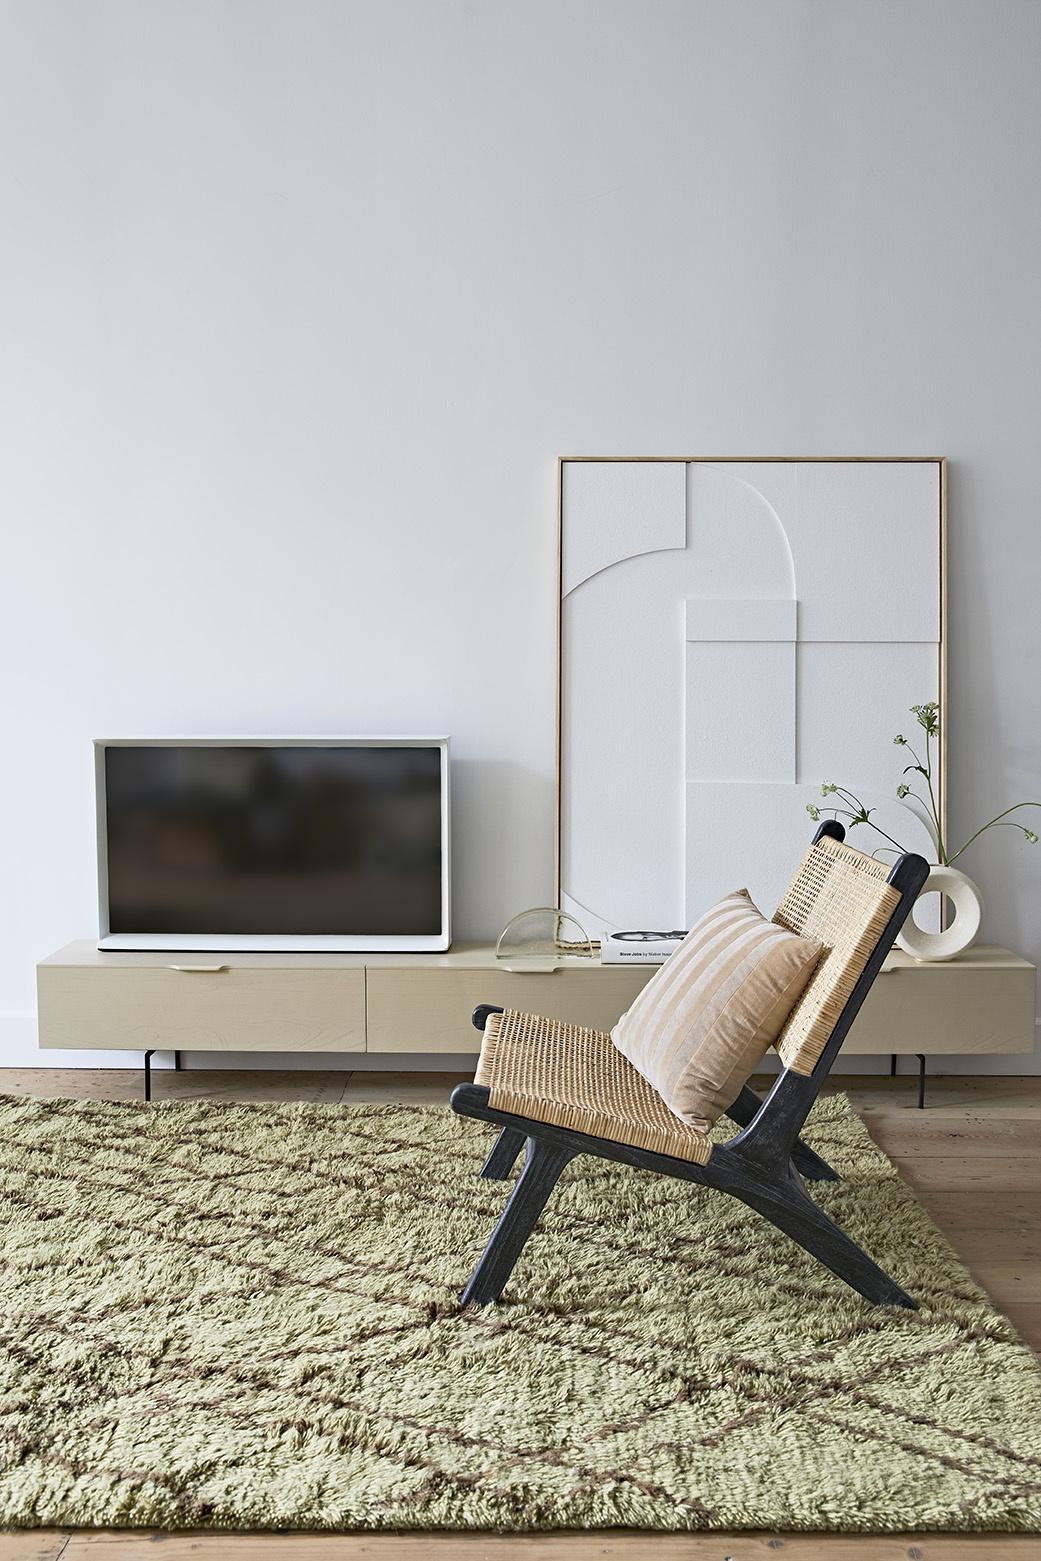 Stoel webbing lounge chair black/natural-2